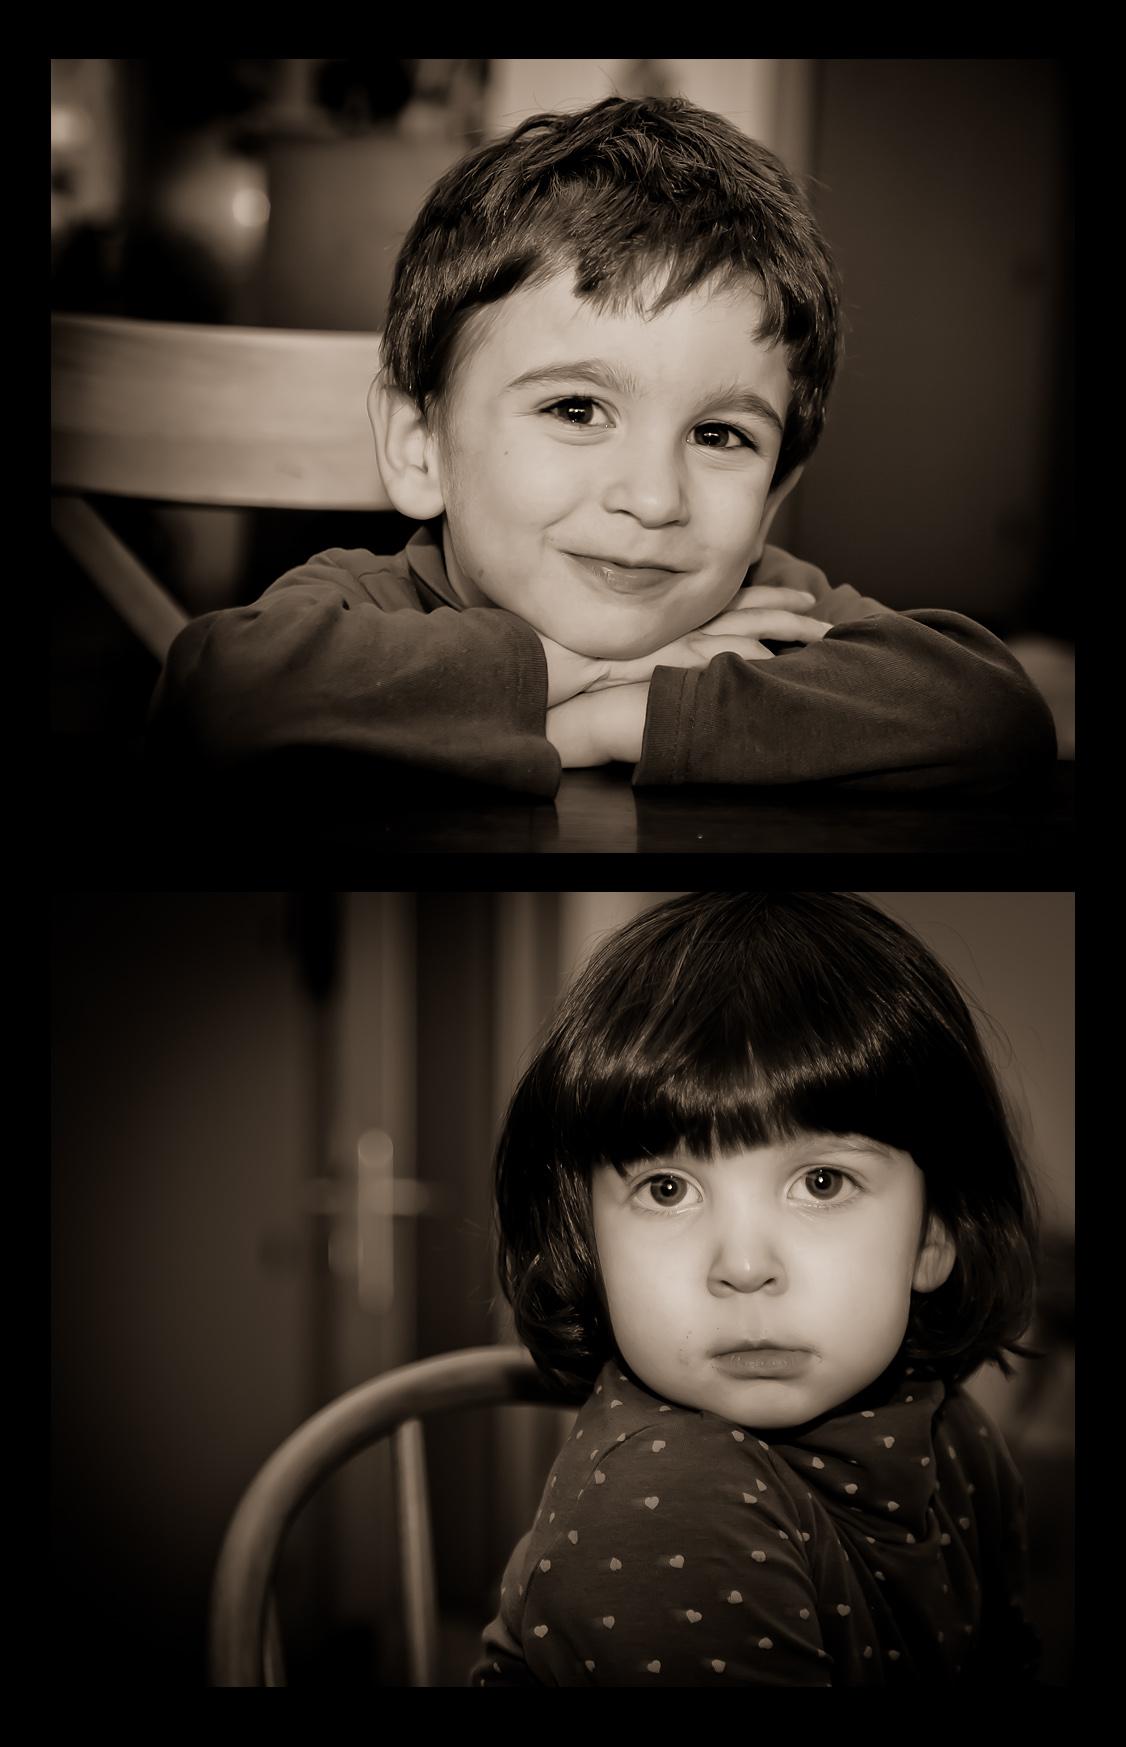 http://fredetsev.eu/imagespourblog/enfants_duo_sepiachic.jpg